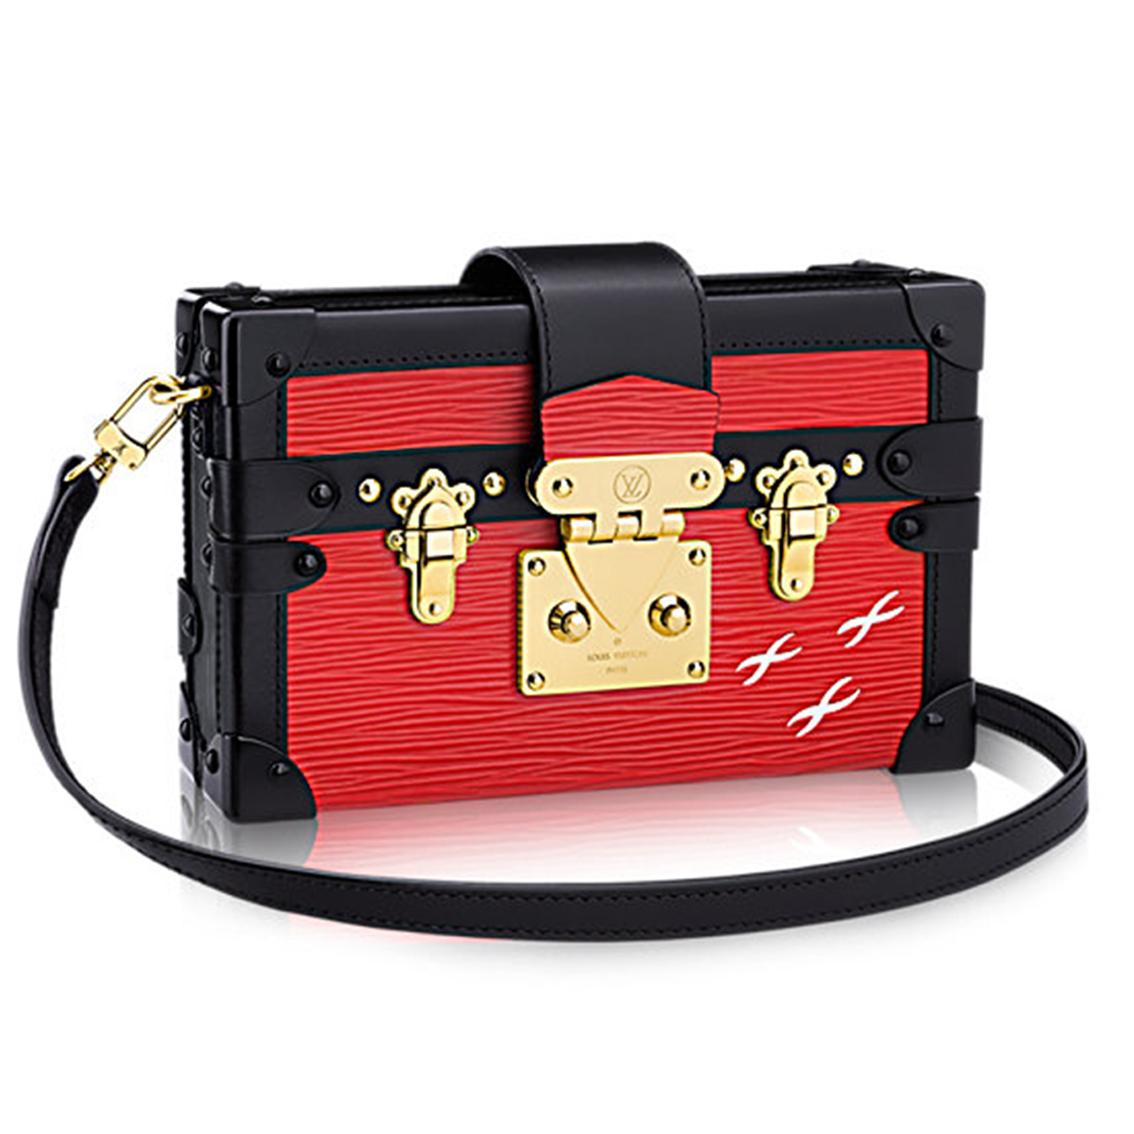 DROPONLY_0000s_0004_louis-vuitton-petite-malle-epi-leather-handbags--M54651_PM2_Front view.jpg